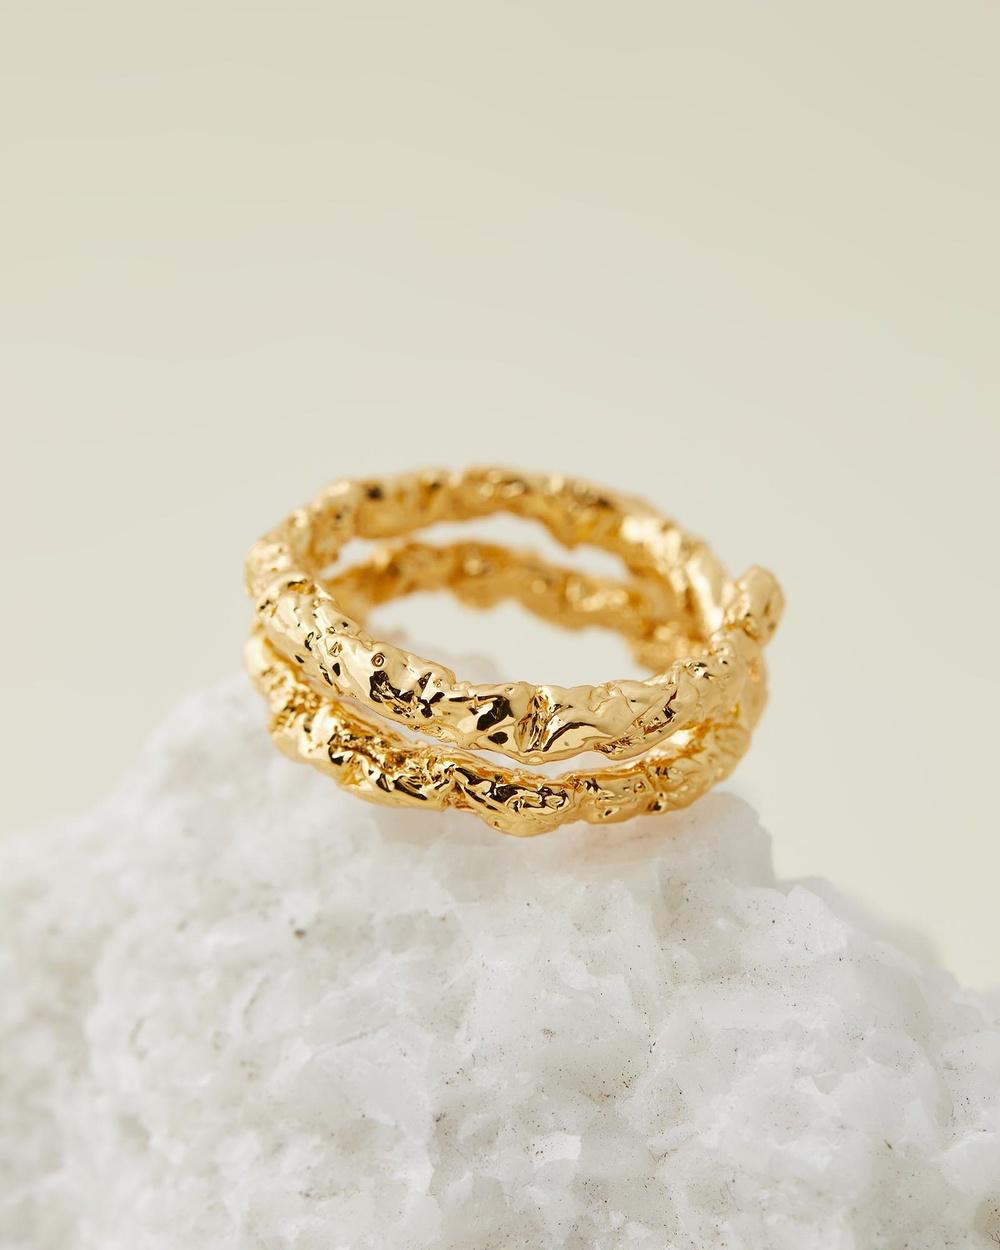 Amber Sceats Isla Ring Jewellery Gold